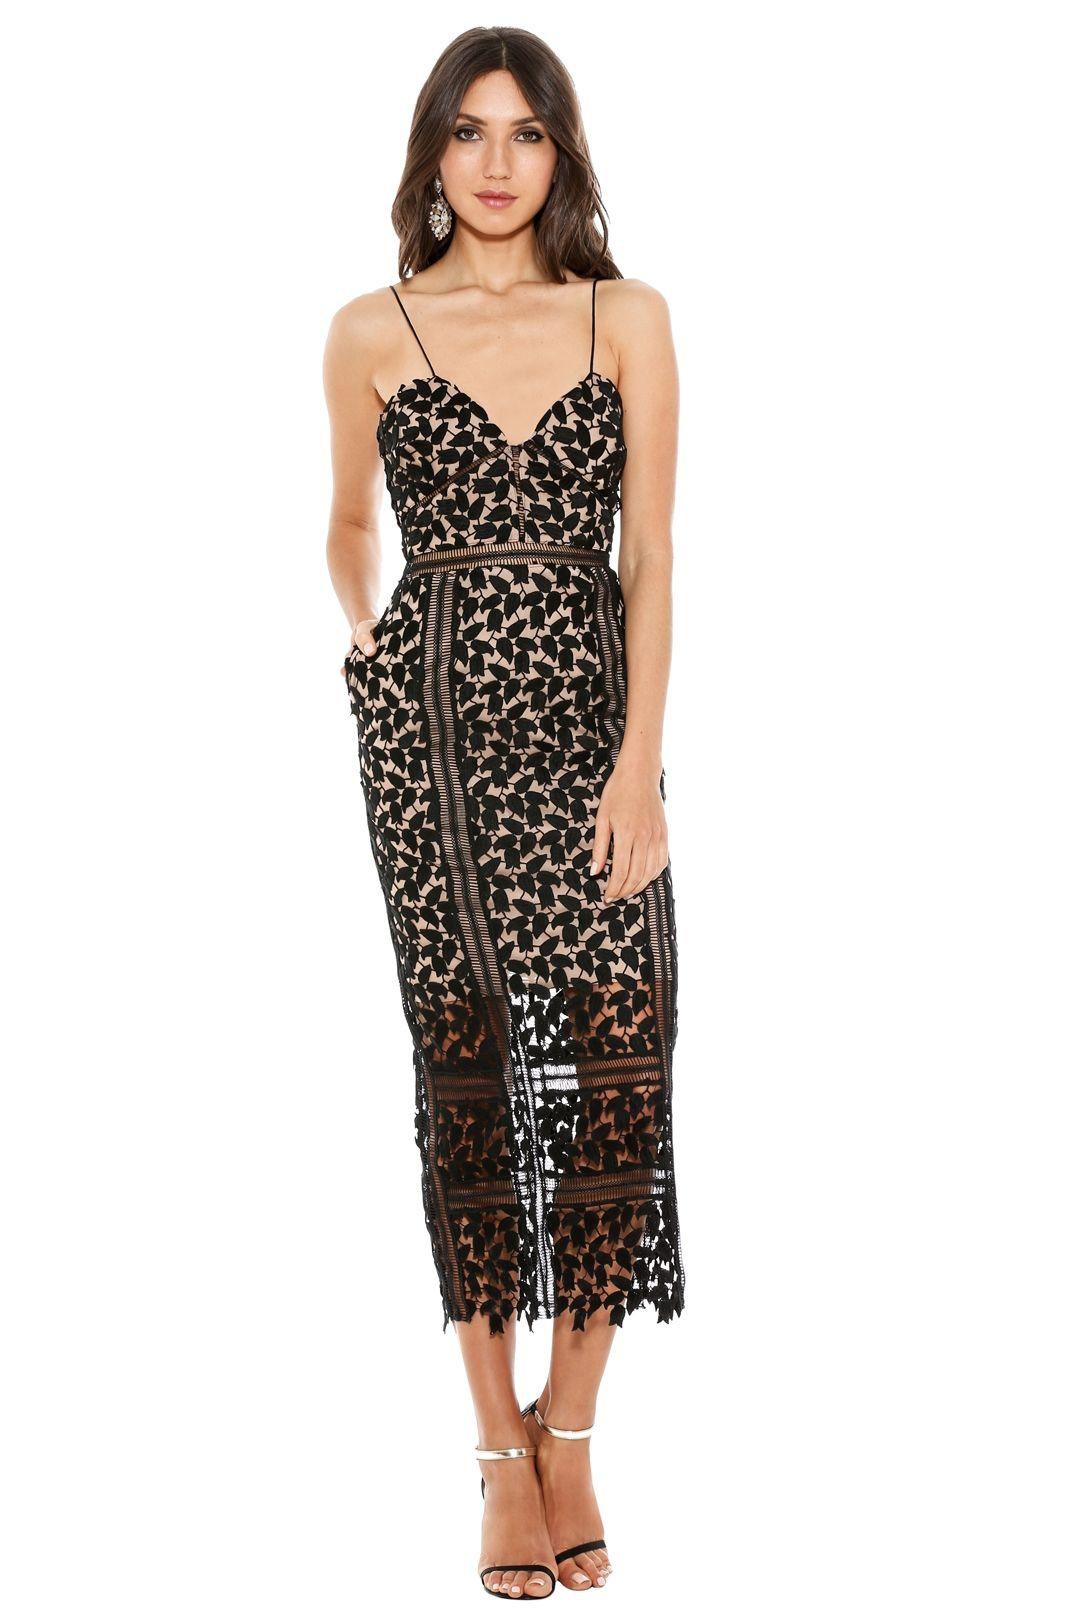 Self Portrait - Arabella Midi Dress - Black Nude - Front